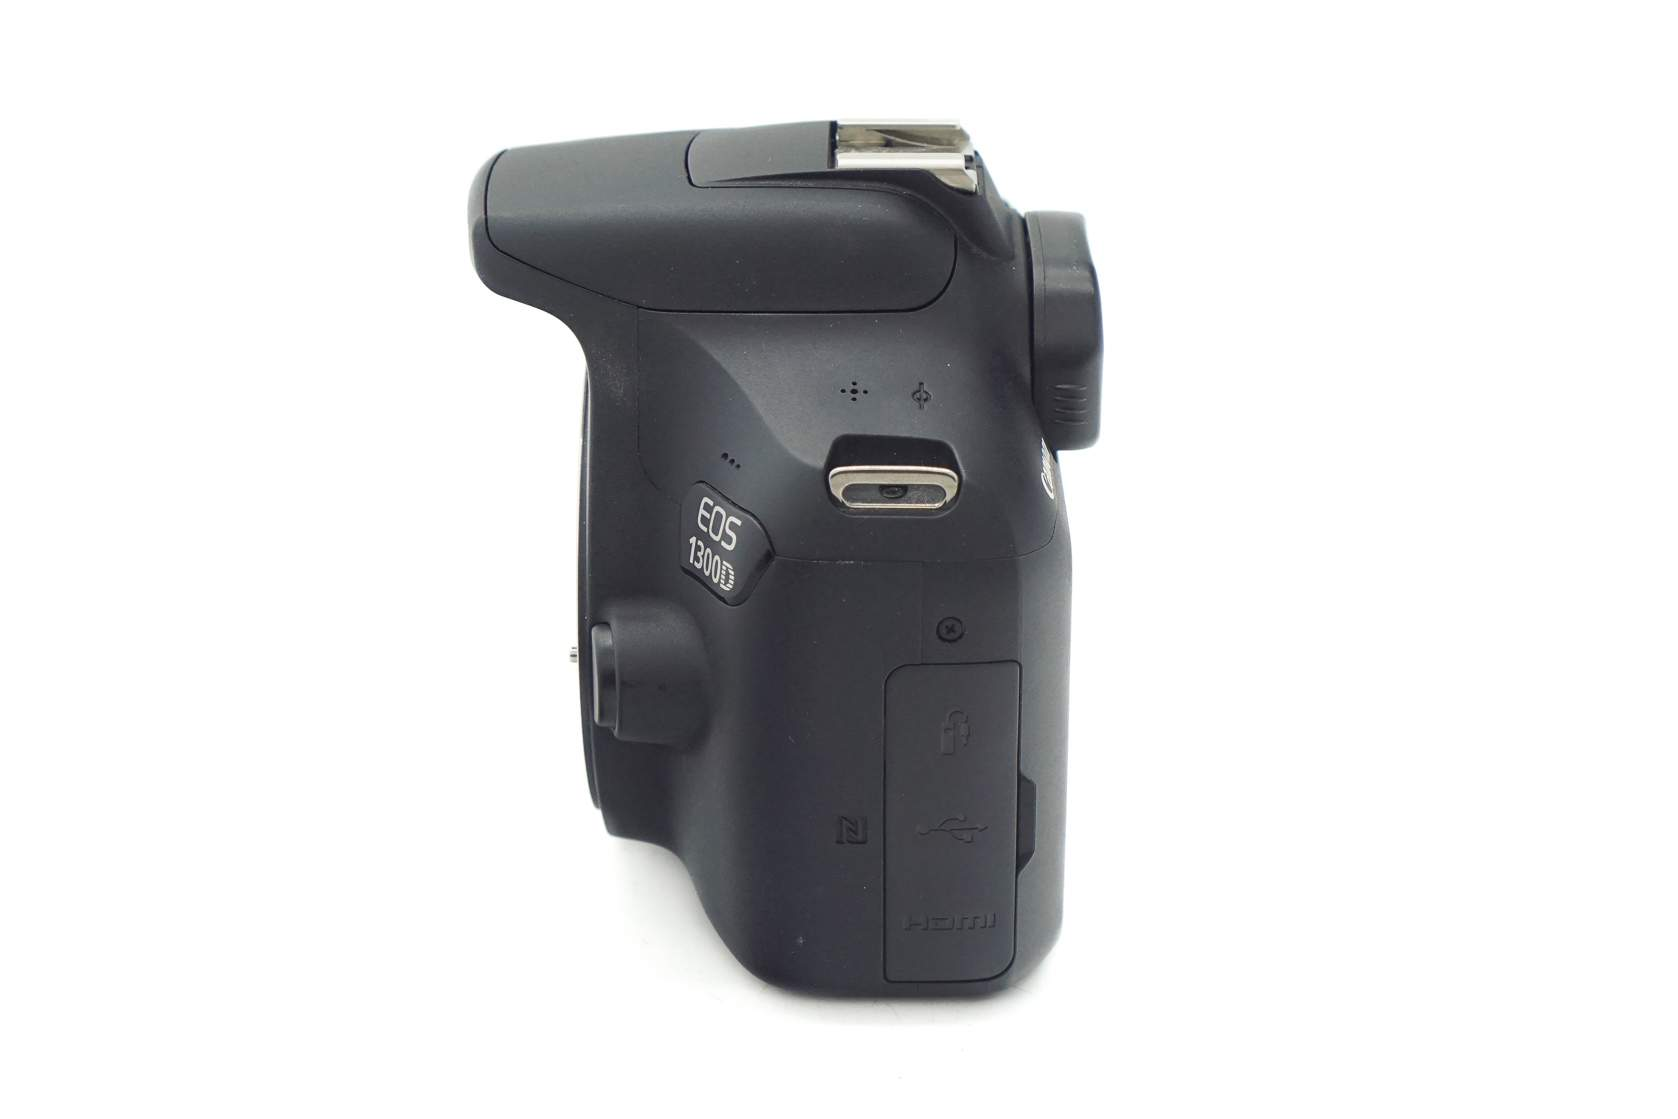 Canon EOS 1300D - Single Lens Kit